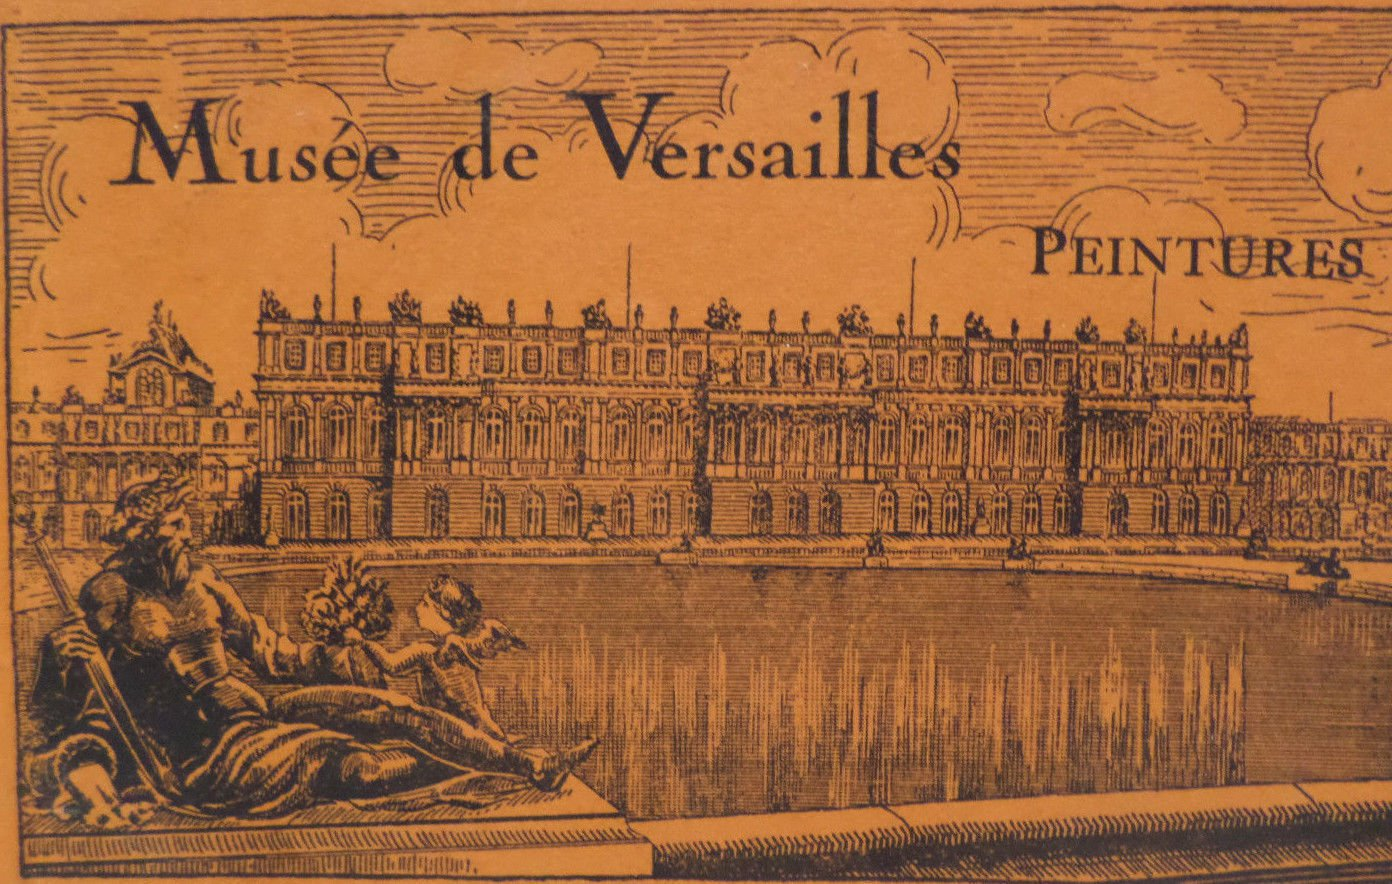 Vintage French Postcards Musee de Versailles Peintures Braun & Cie 23 Postcards